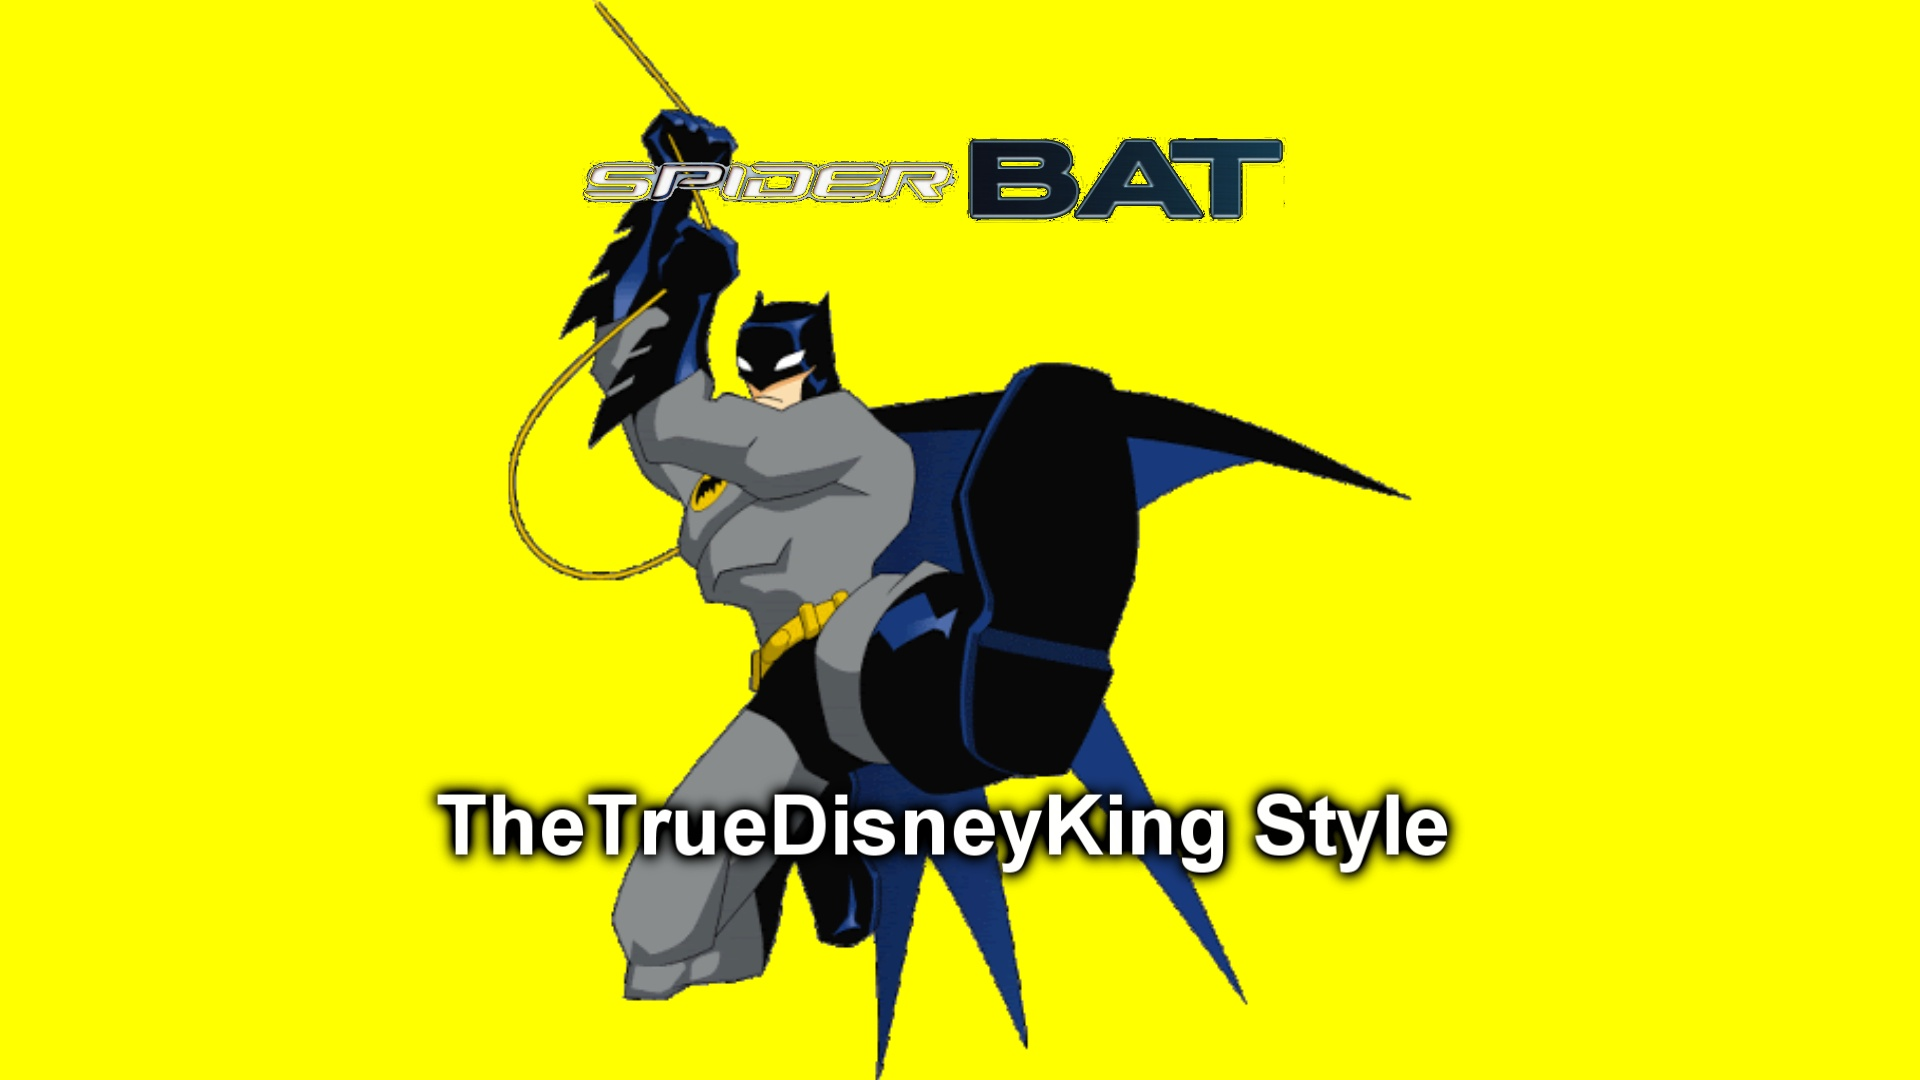 Spider Bat 1967 (TheTureDisneyKing Style)